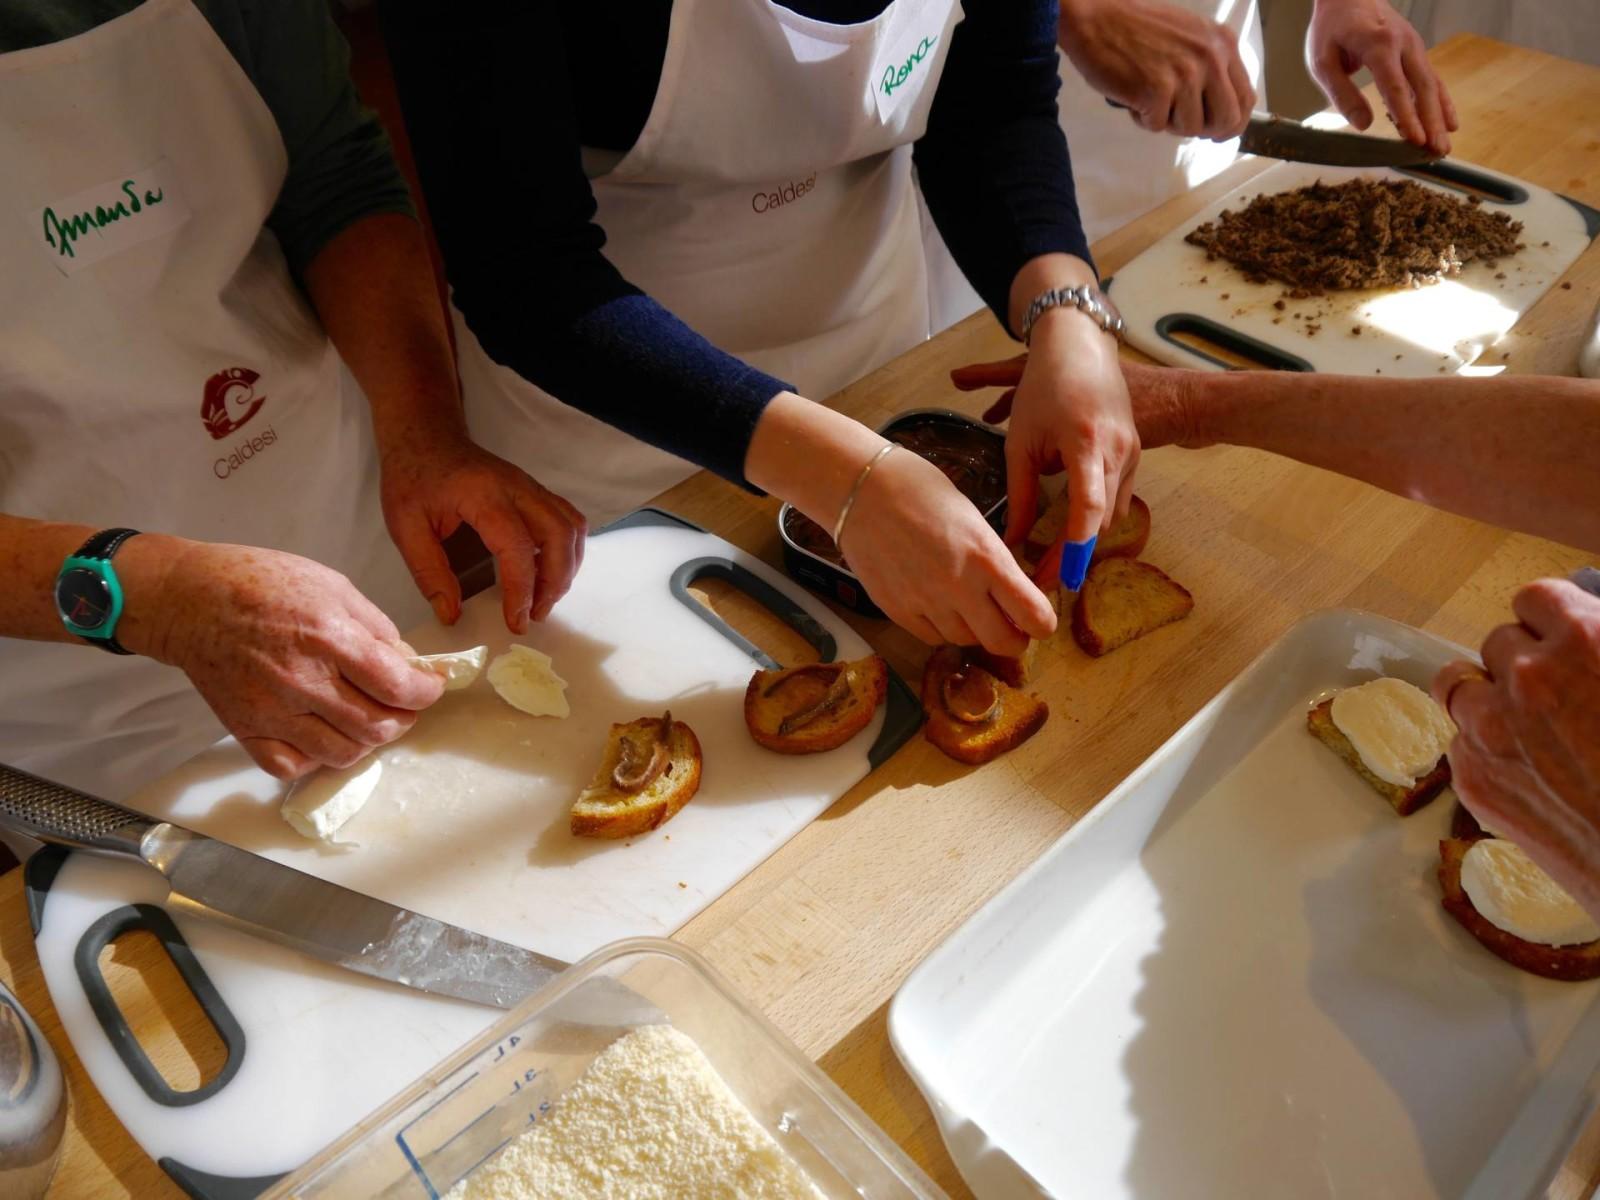 la-cucina-caldesi-cookery-school9